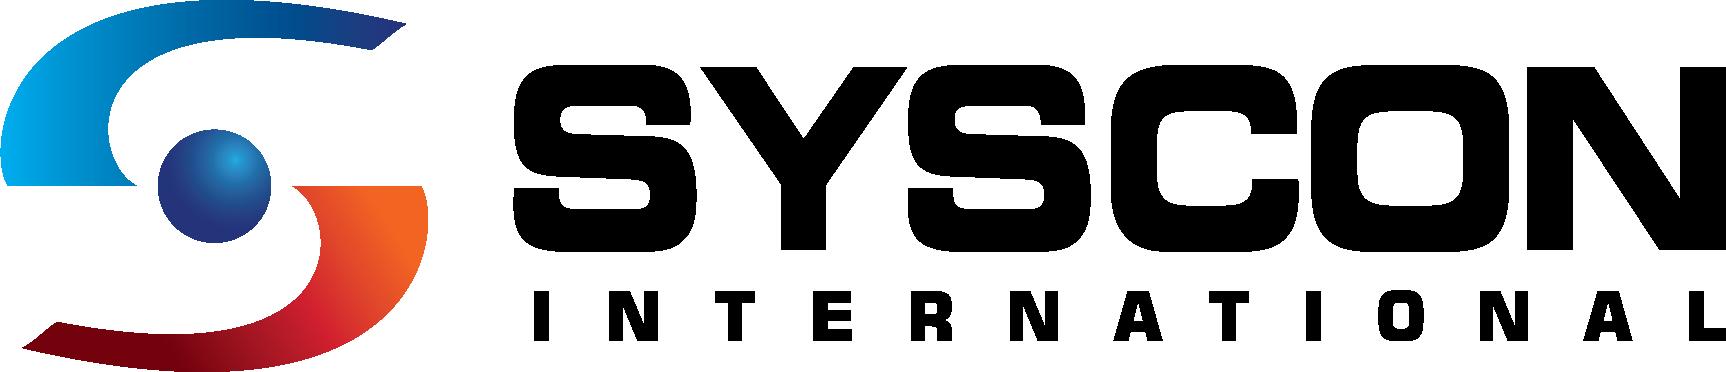 Syscon_Intl_Horizontal.png